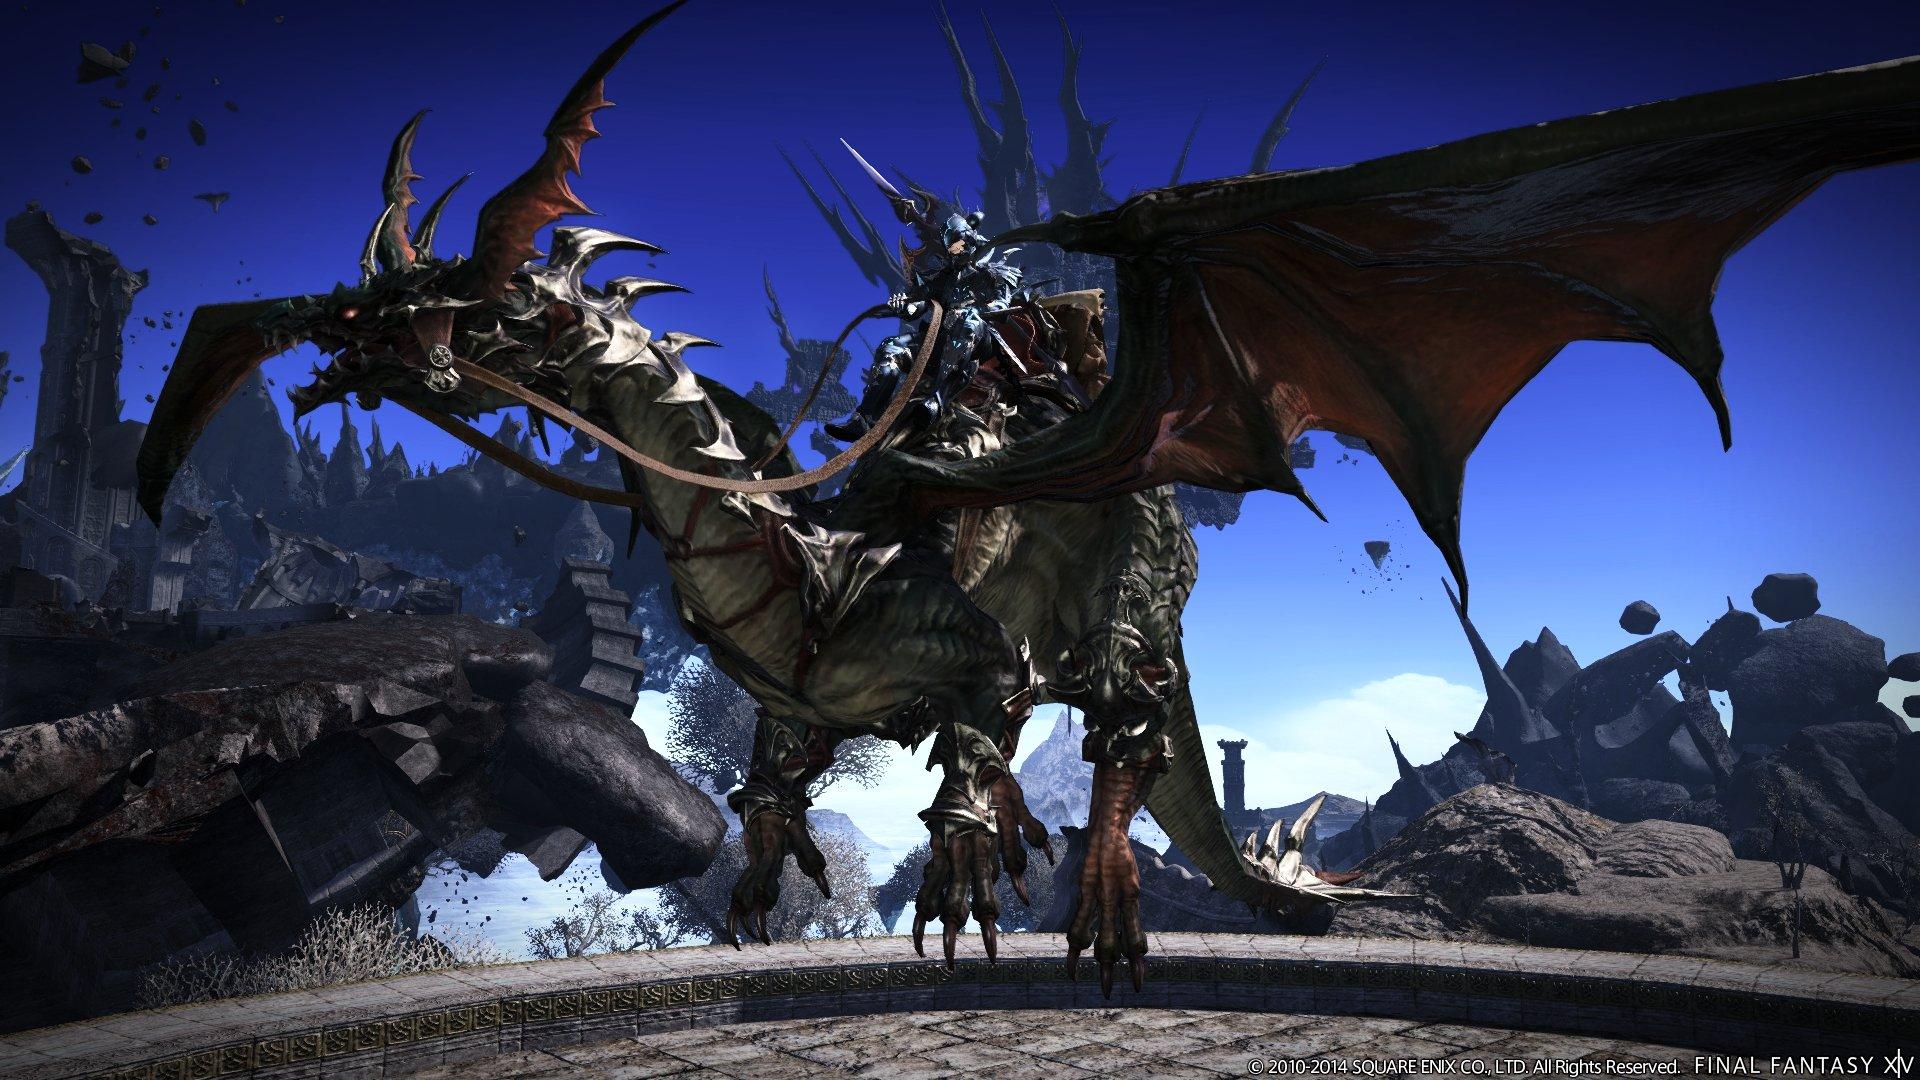 Final Fantasy XIV: Heavensward benchmark is live